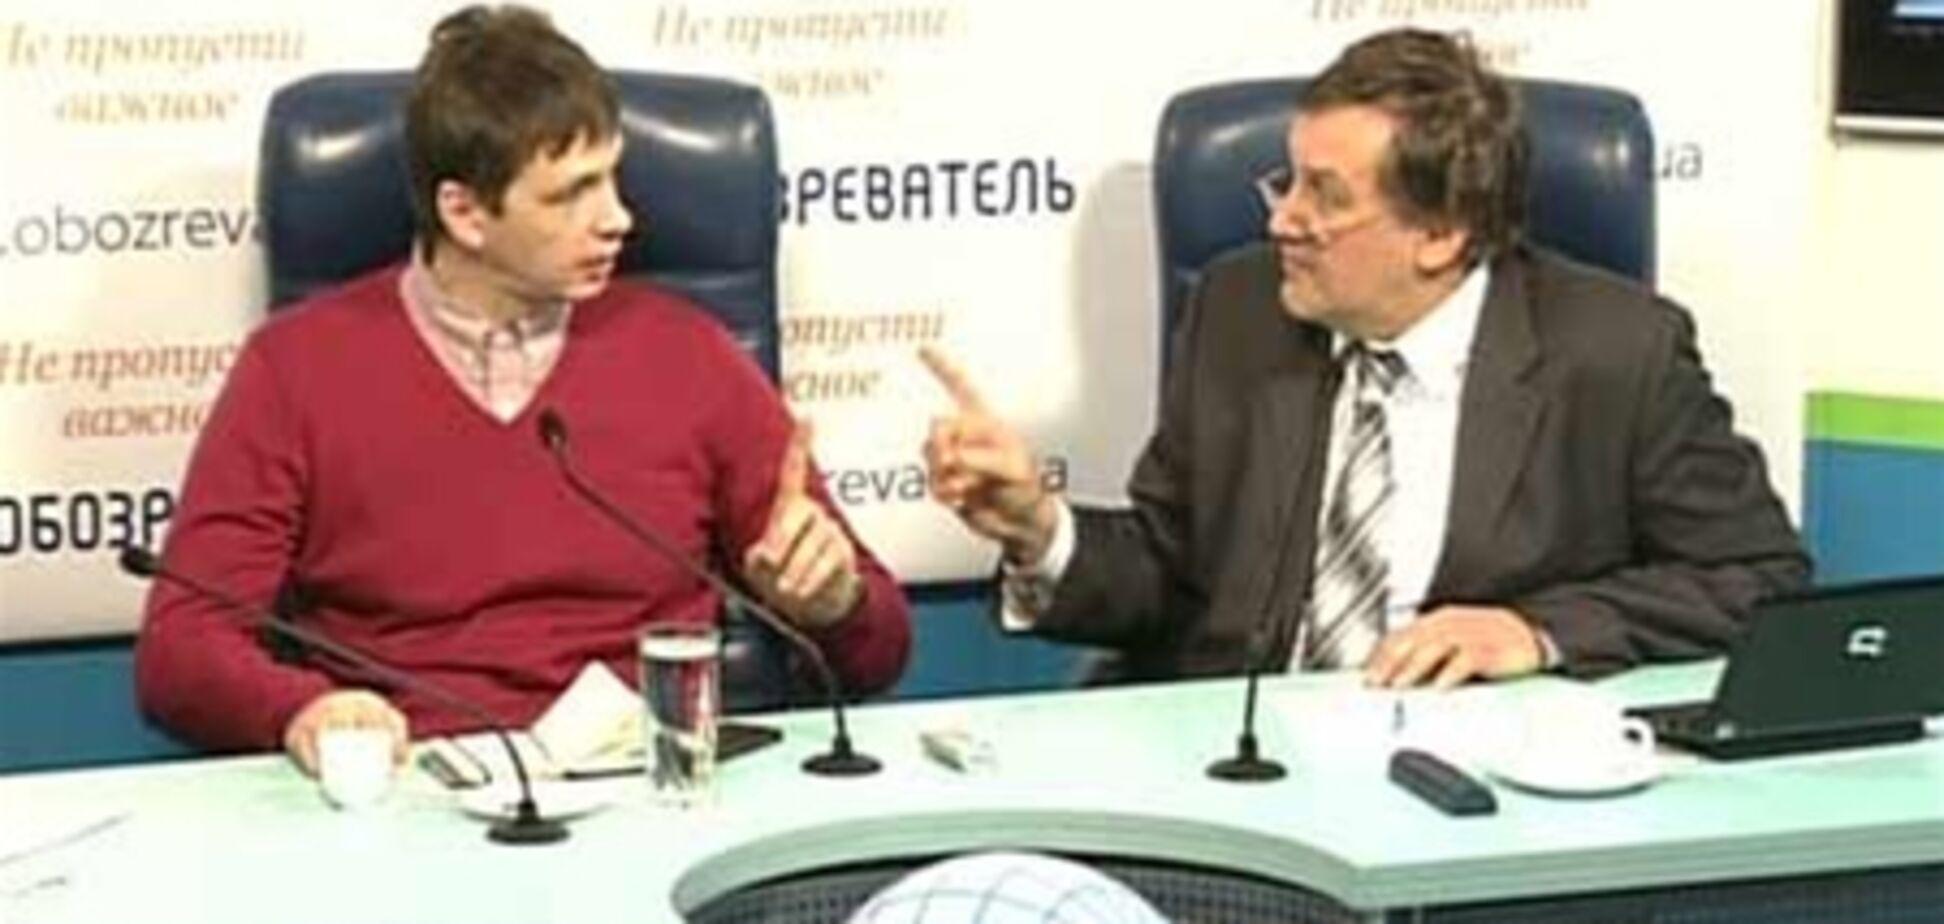 Актуализация темы Тимошенко нежелательна накануне саммита Украина-ЕС – эксперт